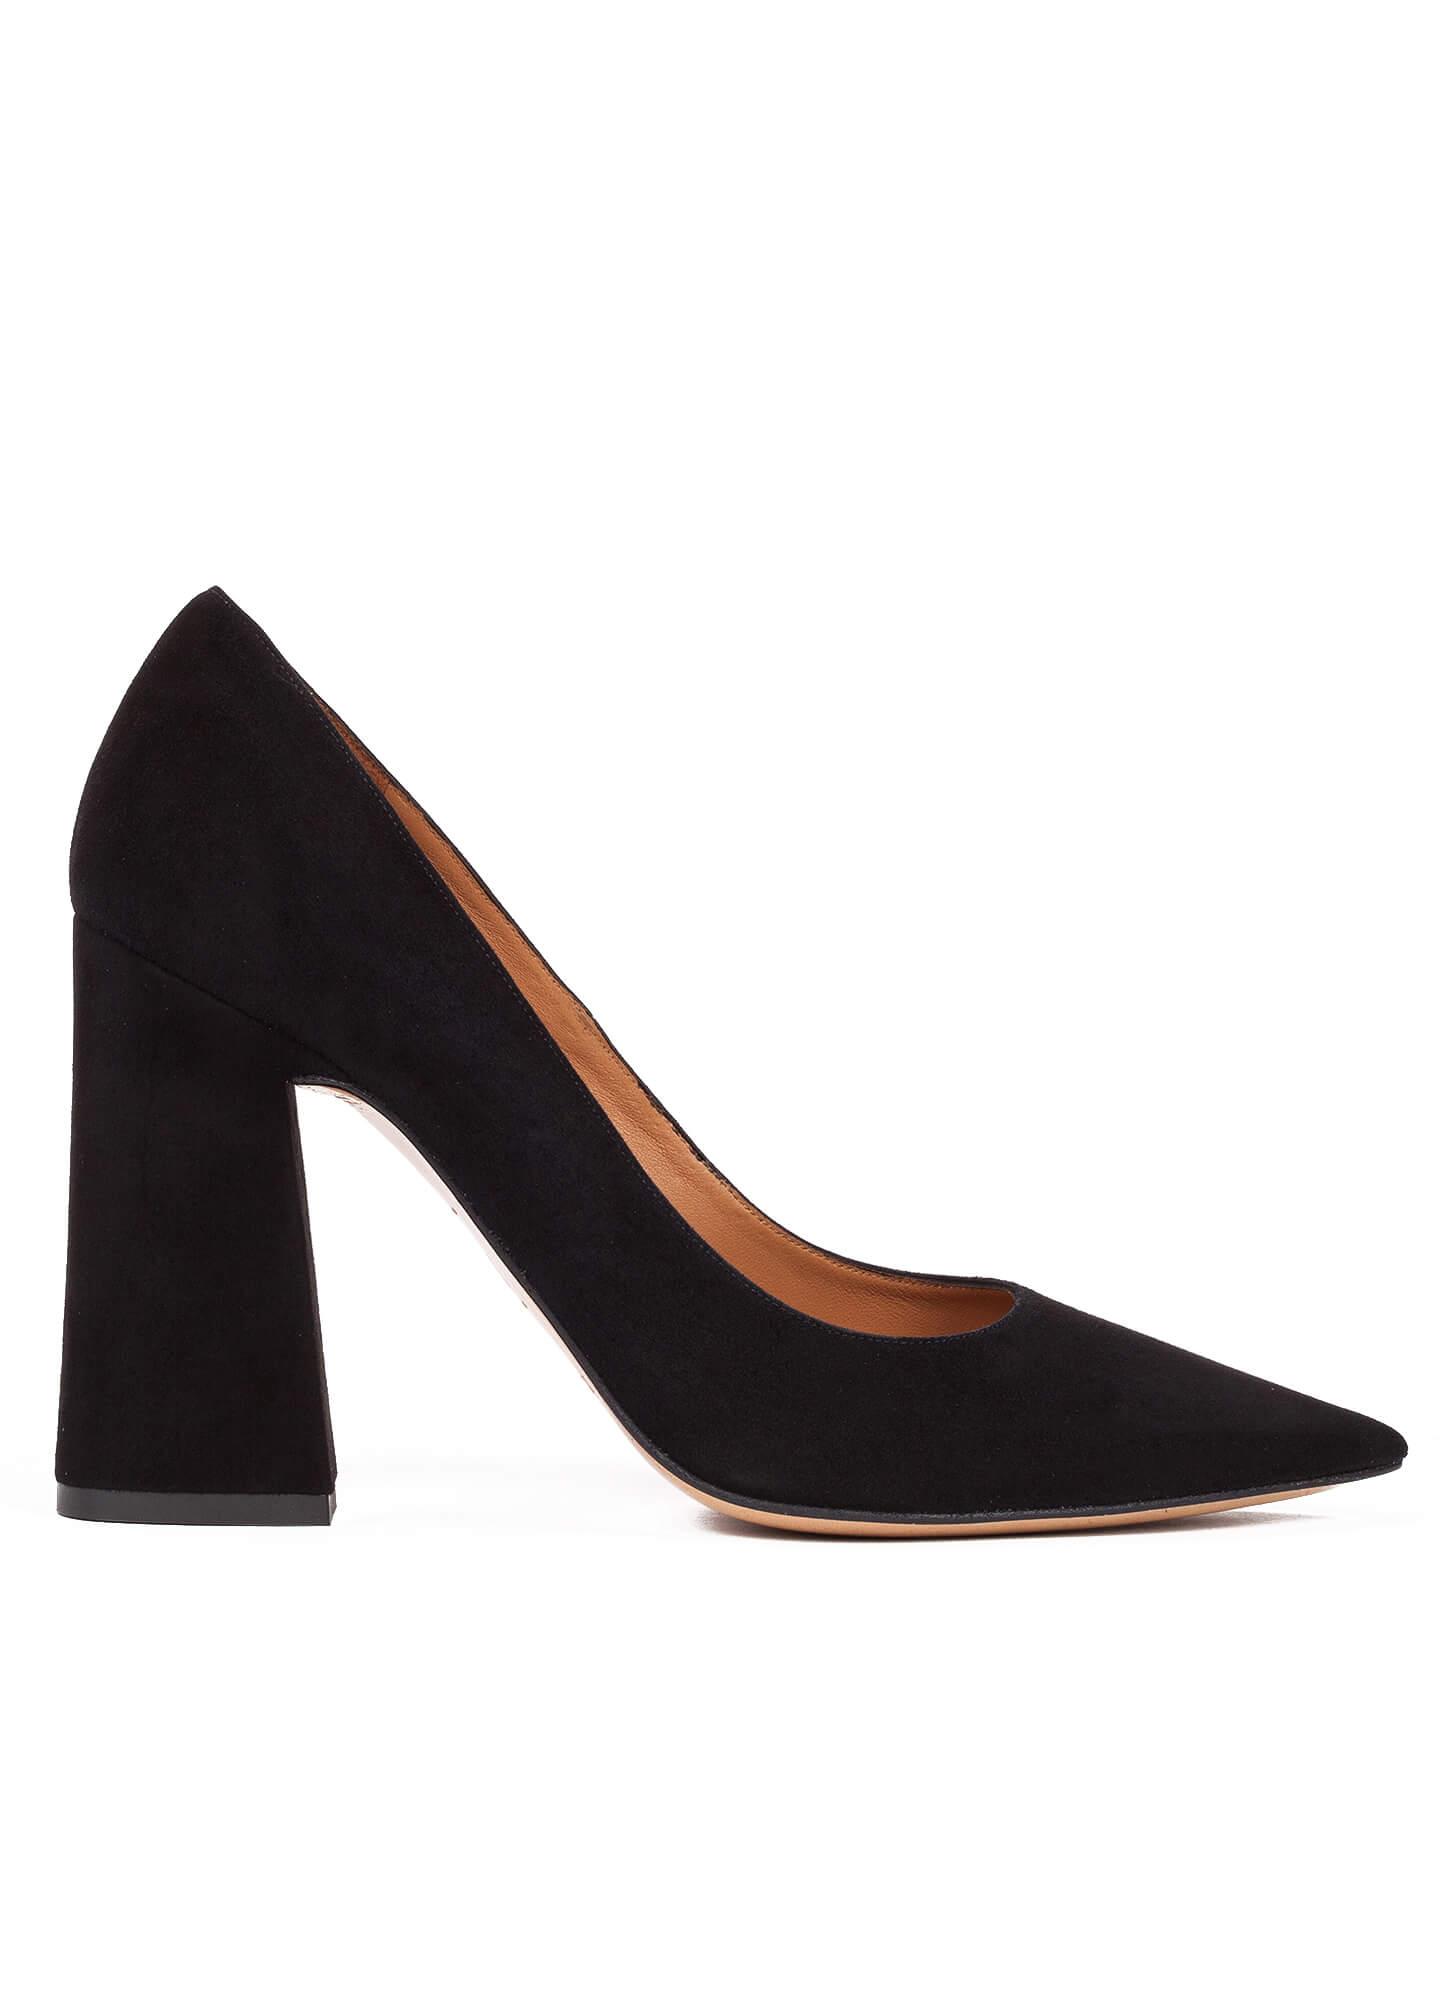 Zapatos de tacón alto en ante negro - tienda de zapatos Pura López ... 4abb32011072